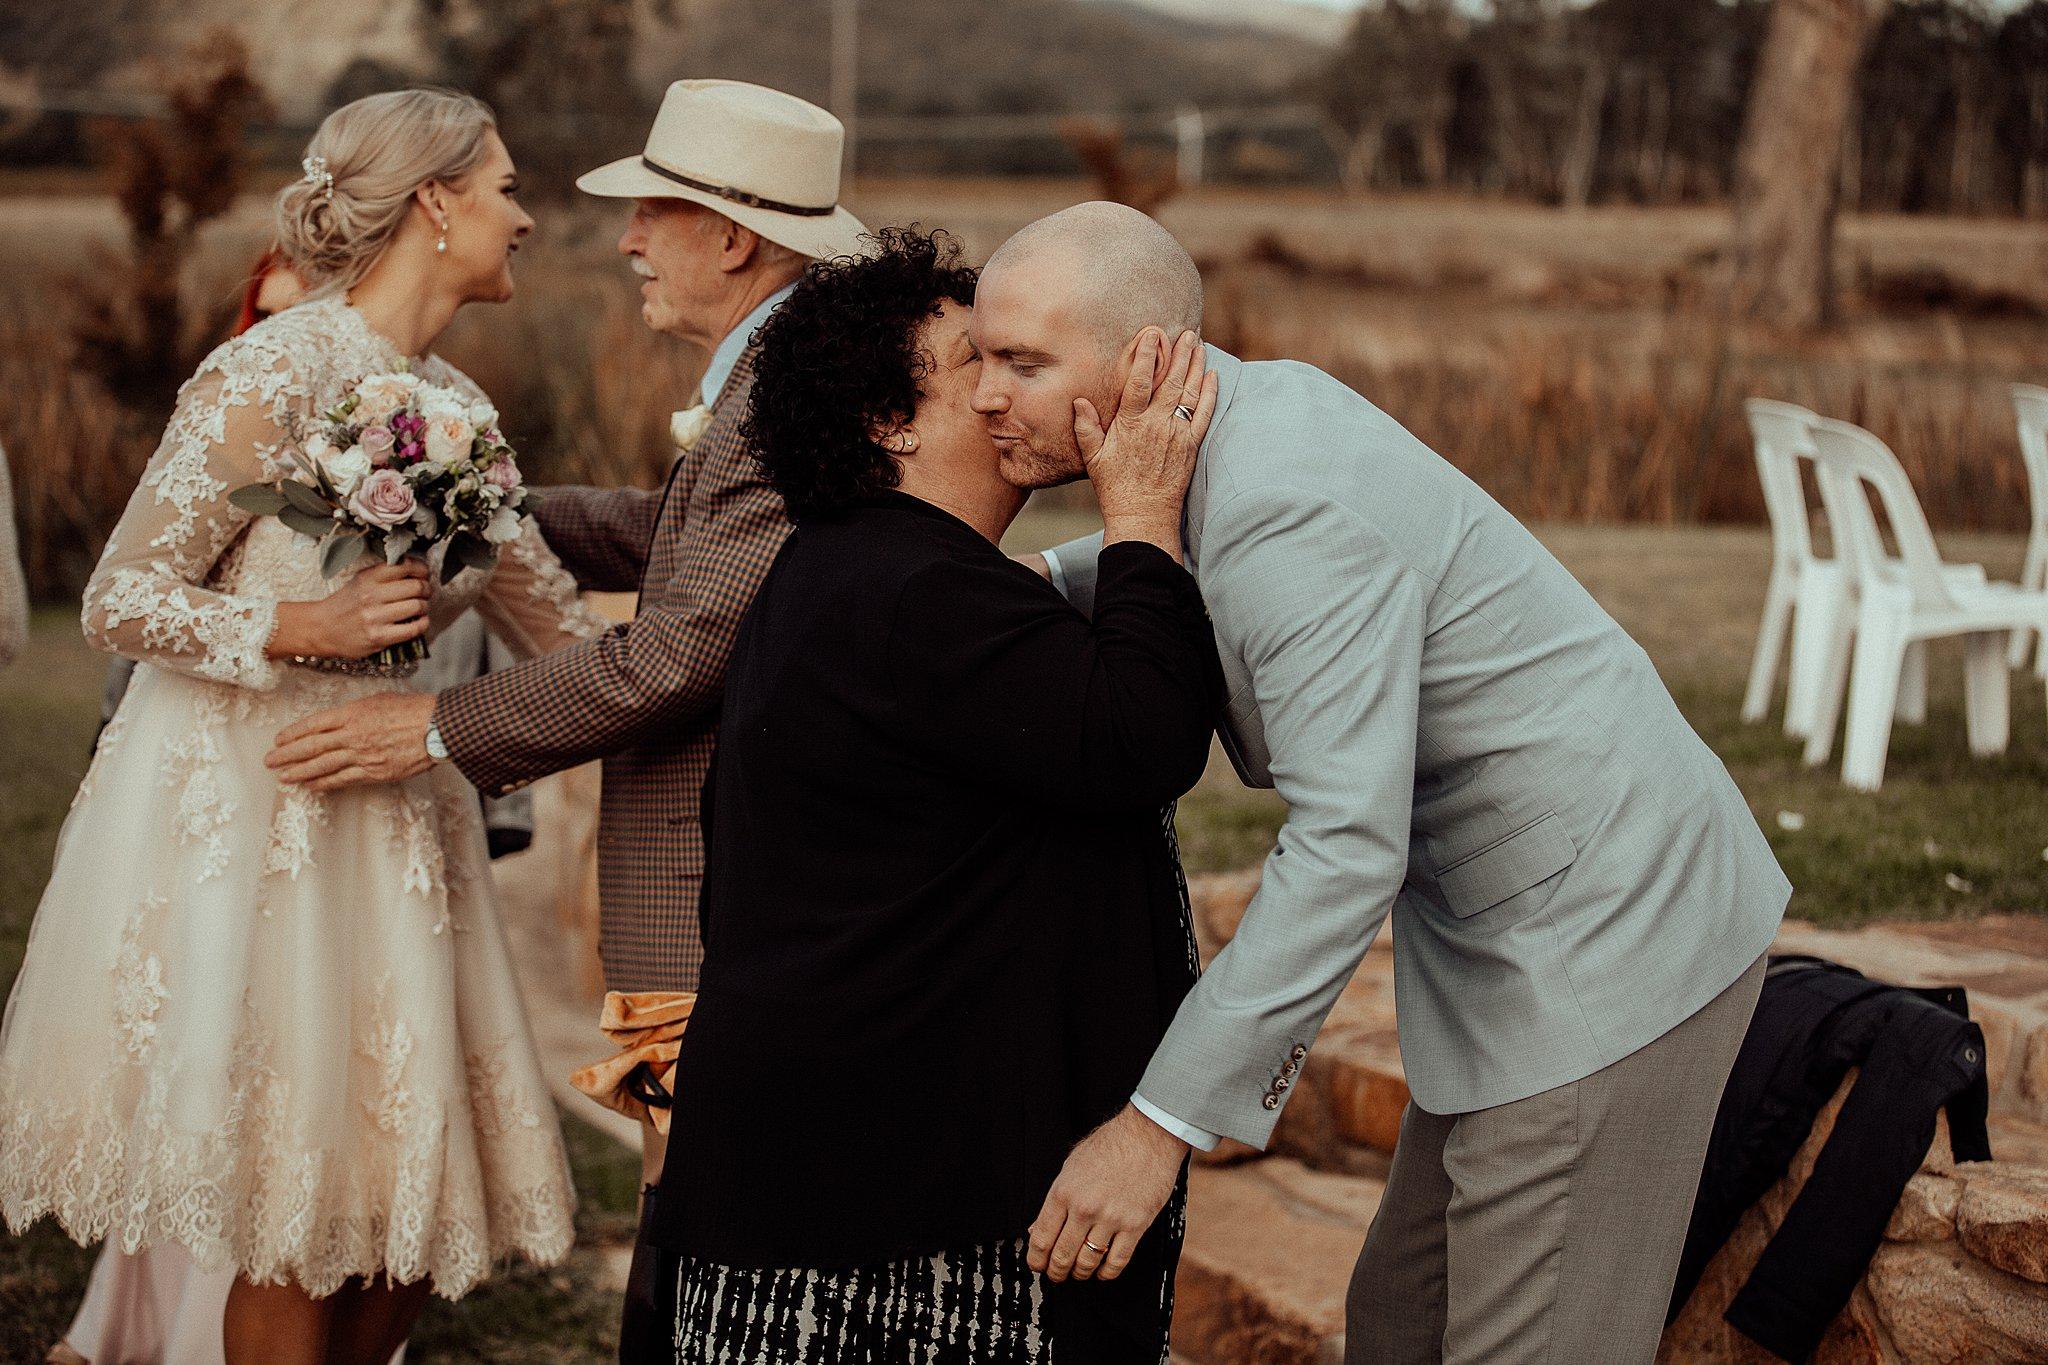 mickalathomas_puremacphotography_weddingphotographer_couplephotographer_Sheppartonphotographer_3439.jpg